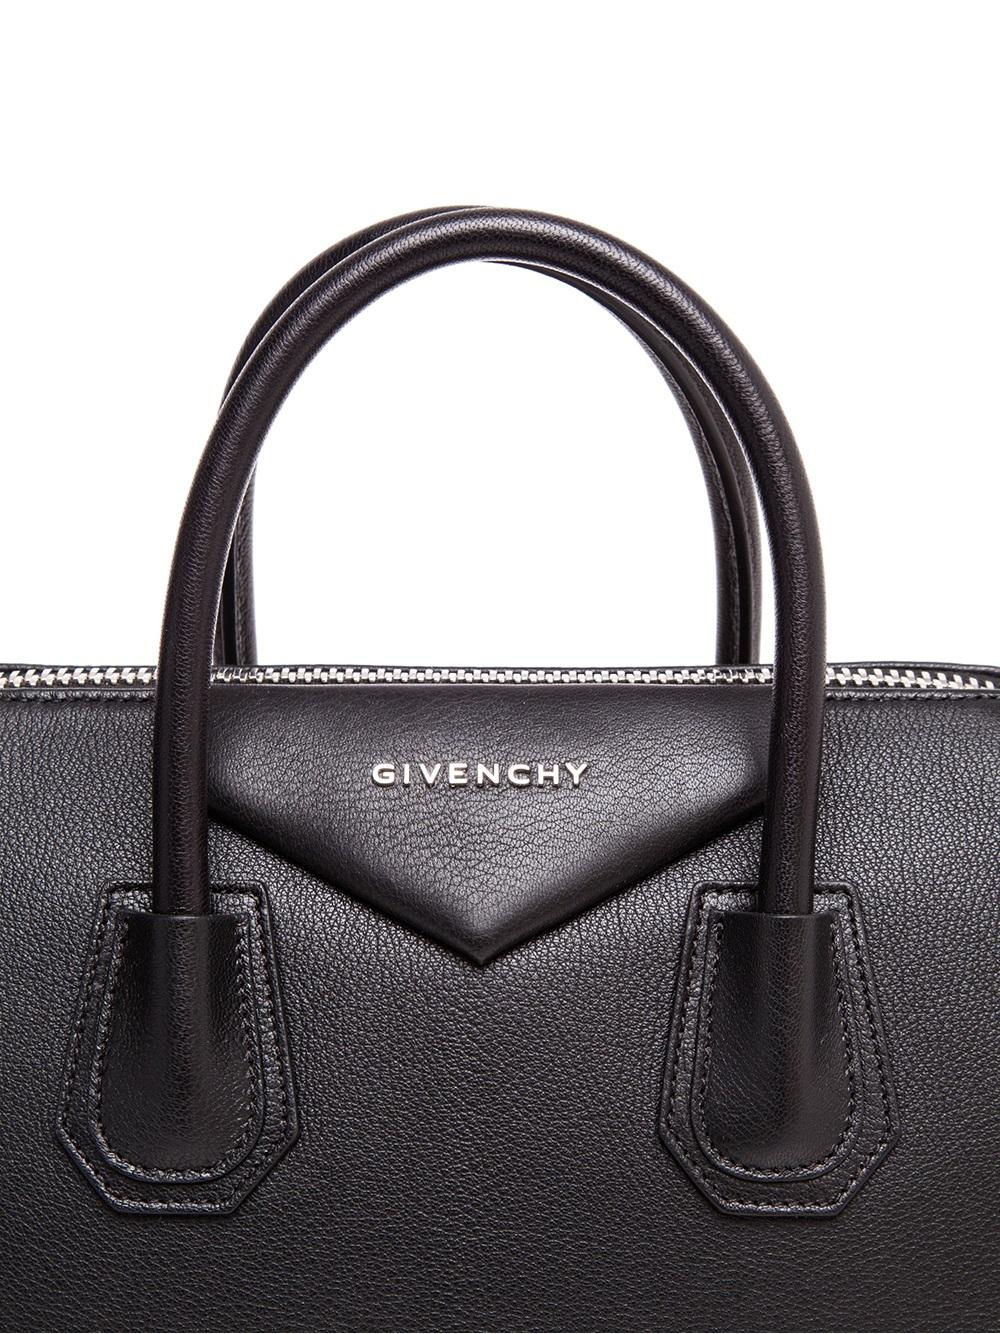 ... wholesale outlet 34f4c 5df30 Givenchy Antigona Handbag 352562 Collector  Square ... 9e78f6b881